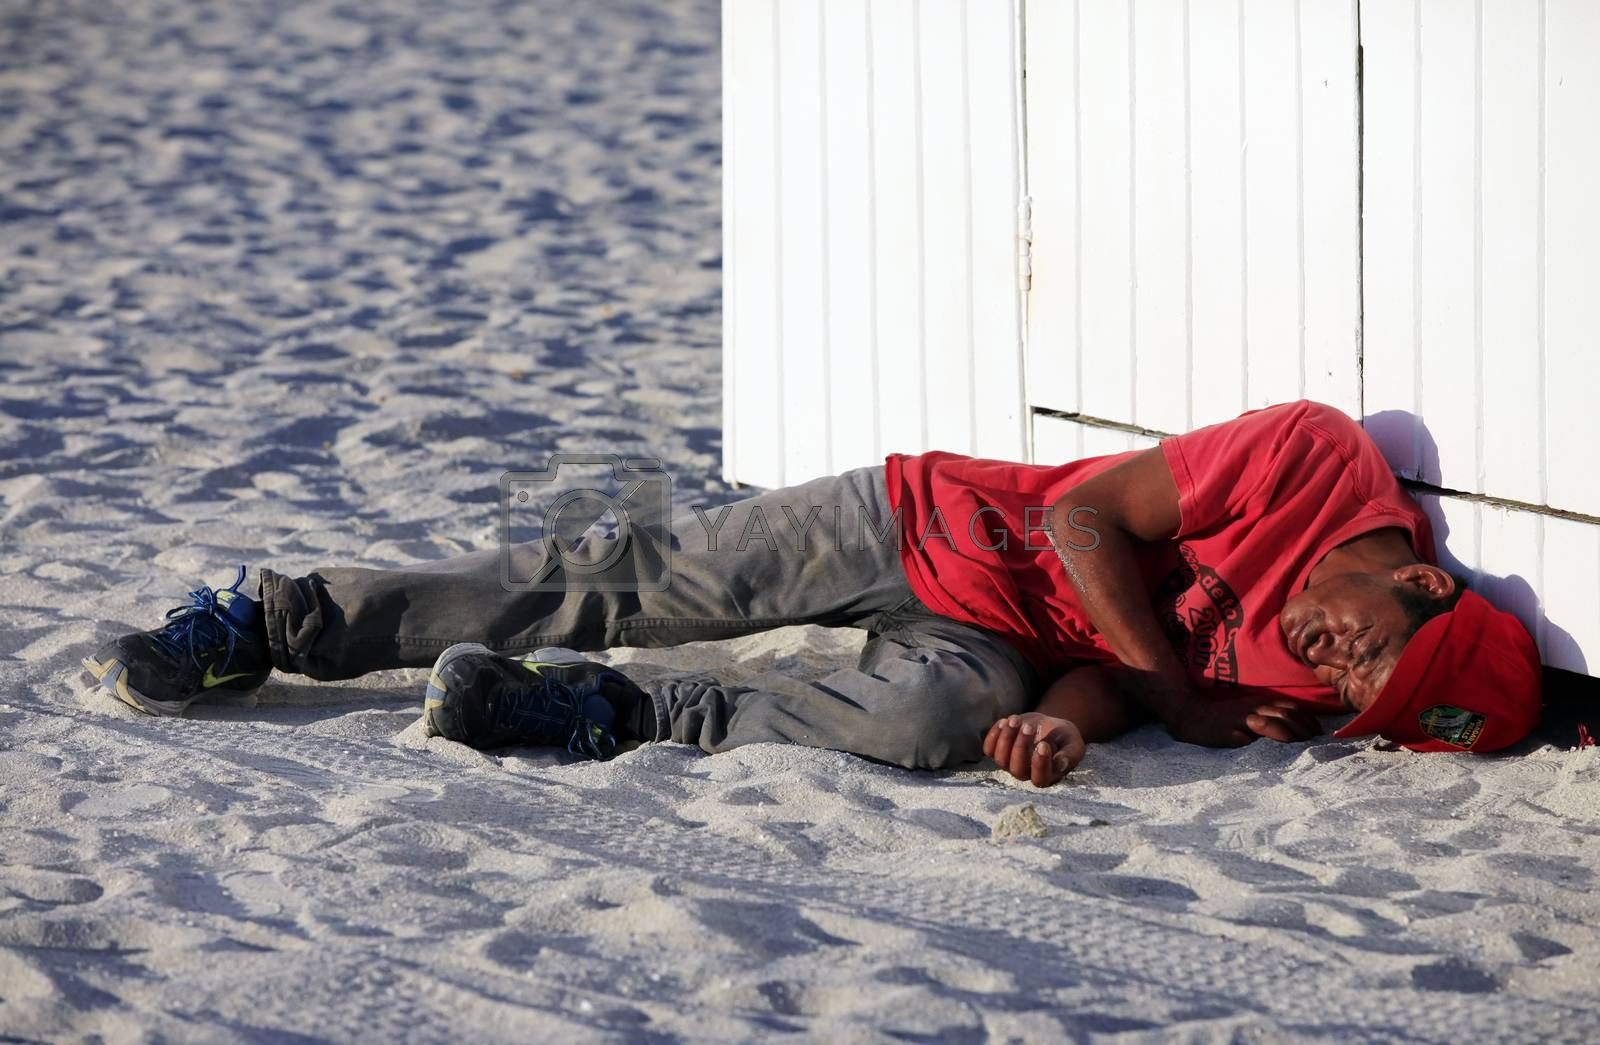 Miami Beach, USA - May 5, 2013: Sleeping homeless drunkard lying on the beach in Miami